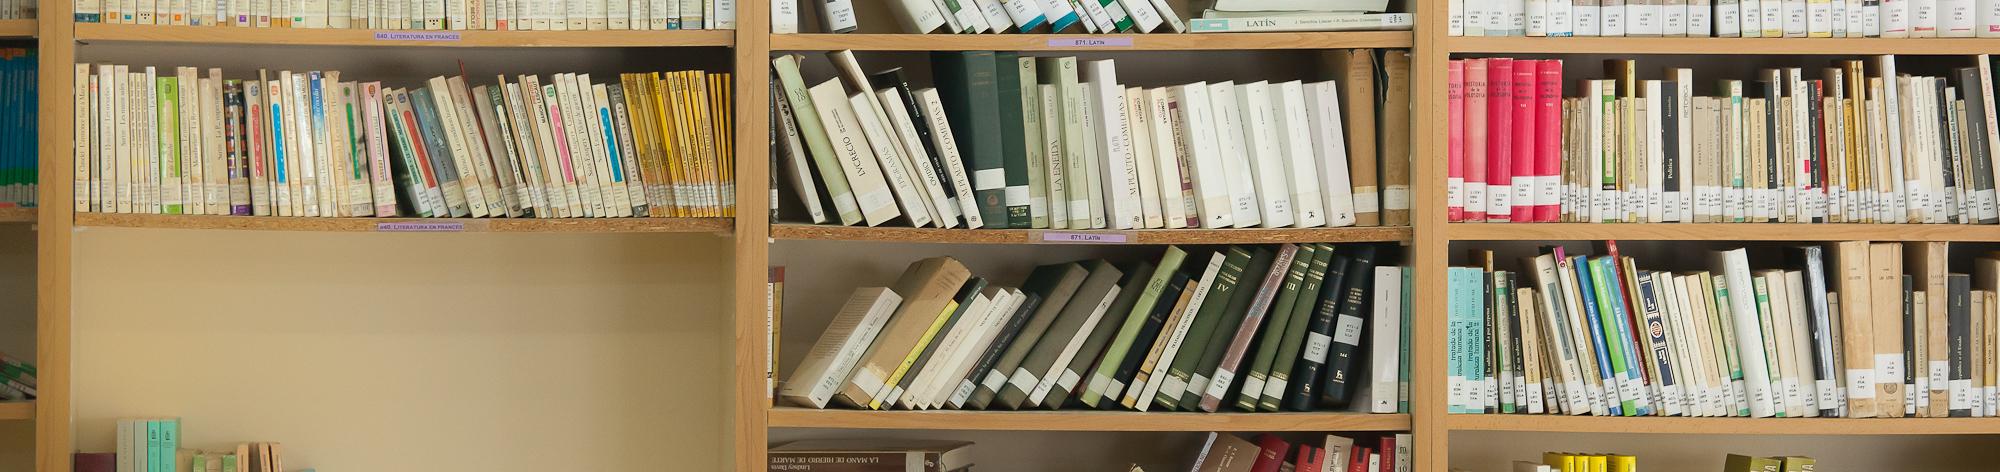 biblioteca 2r